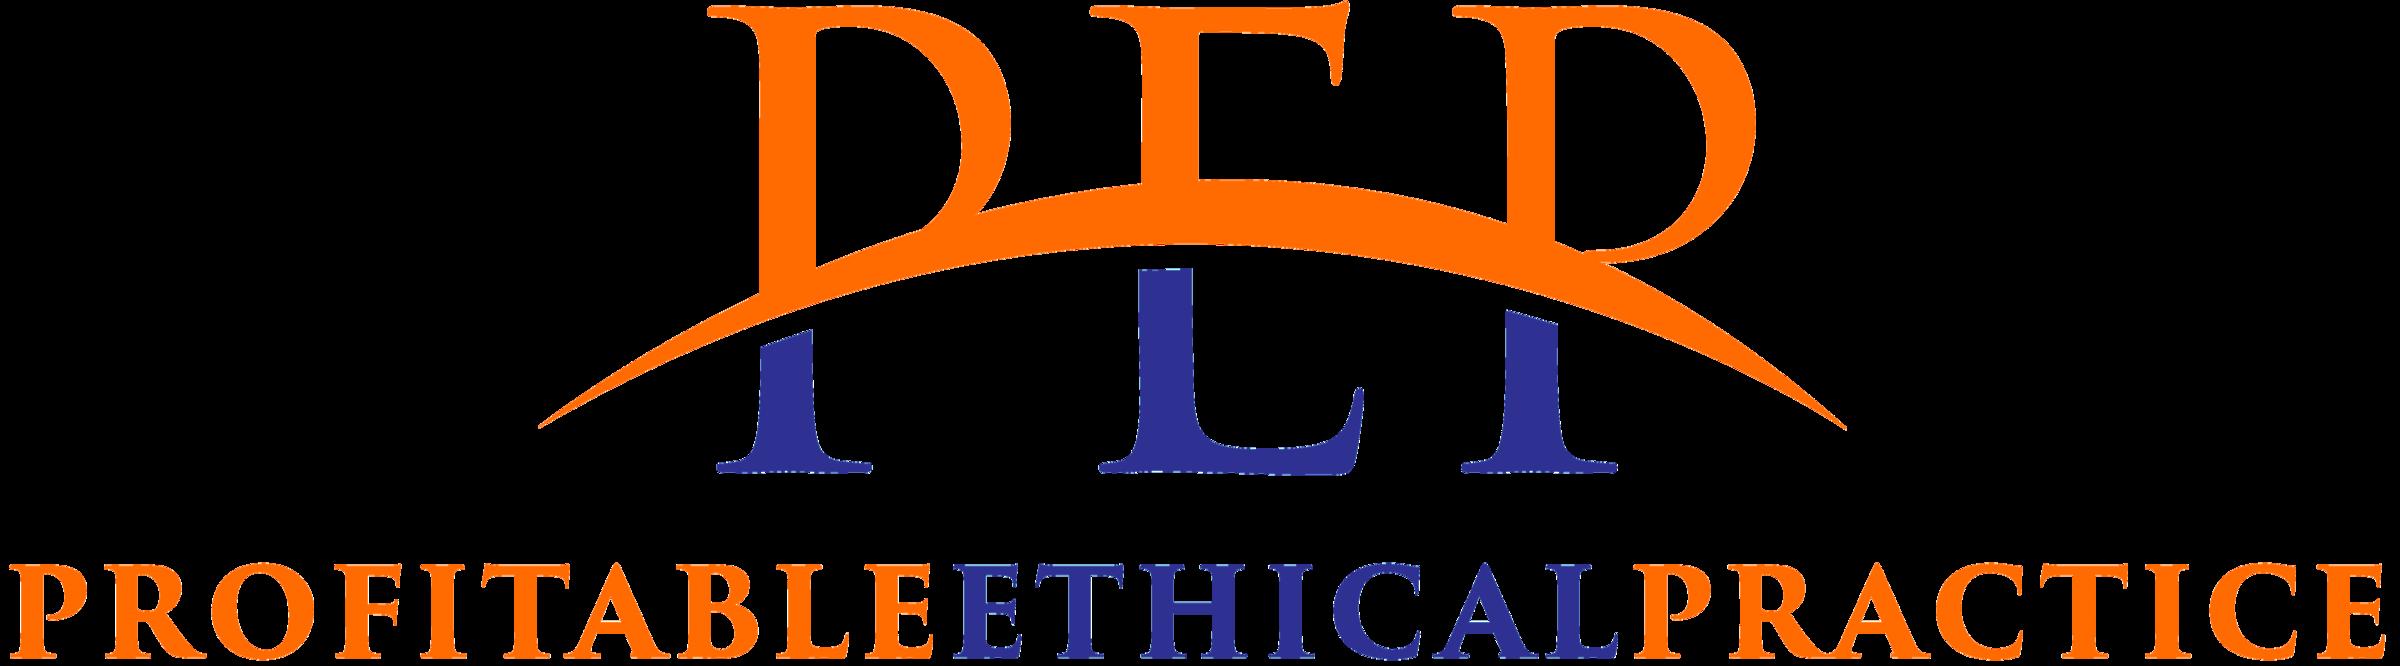 PEP Dark Logo Trans